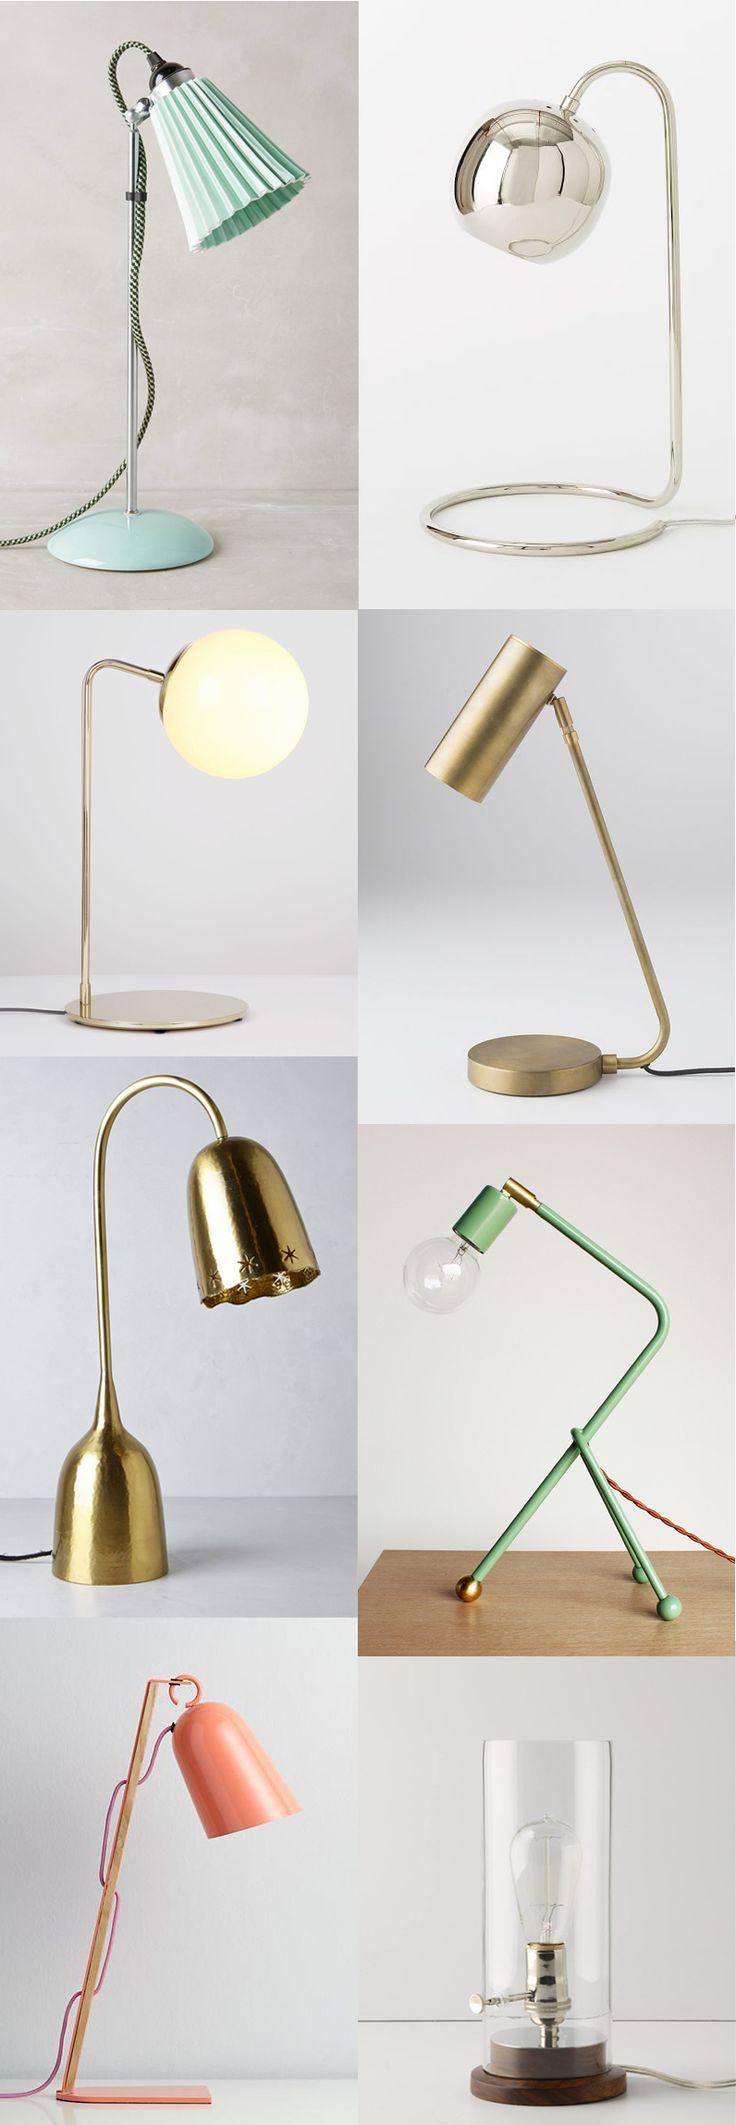 Desk Lamps: My Top Picks for Modern Workspace Lighting